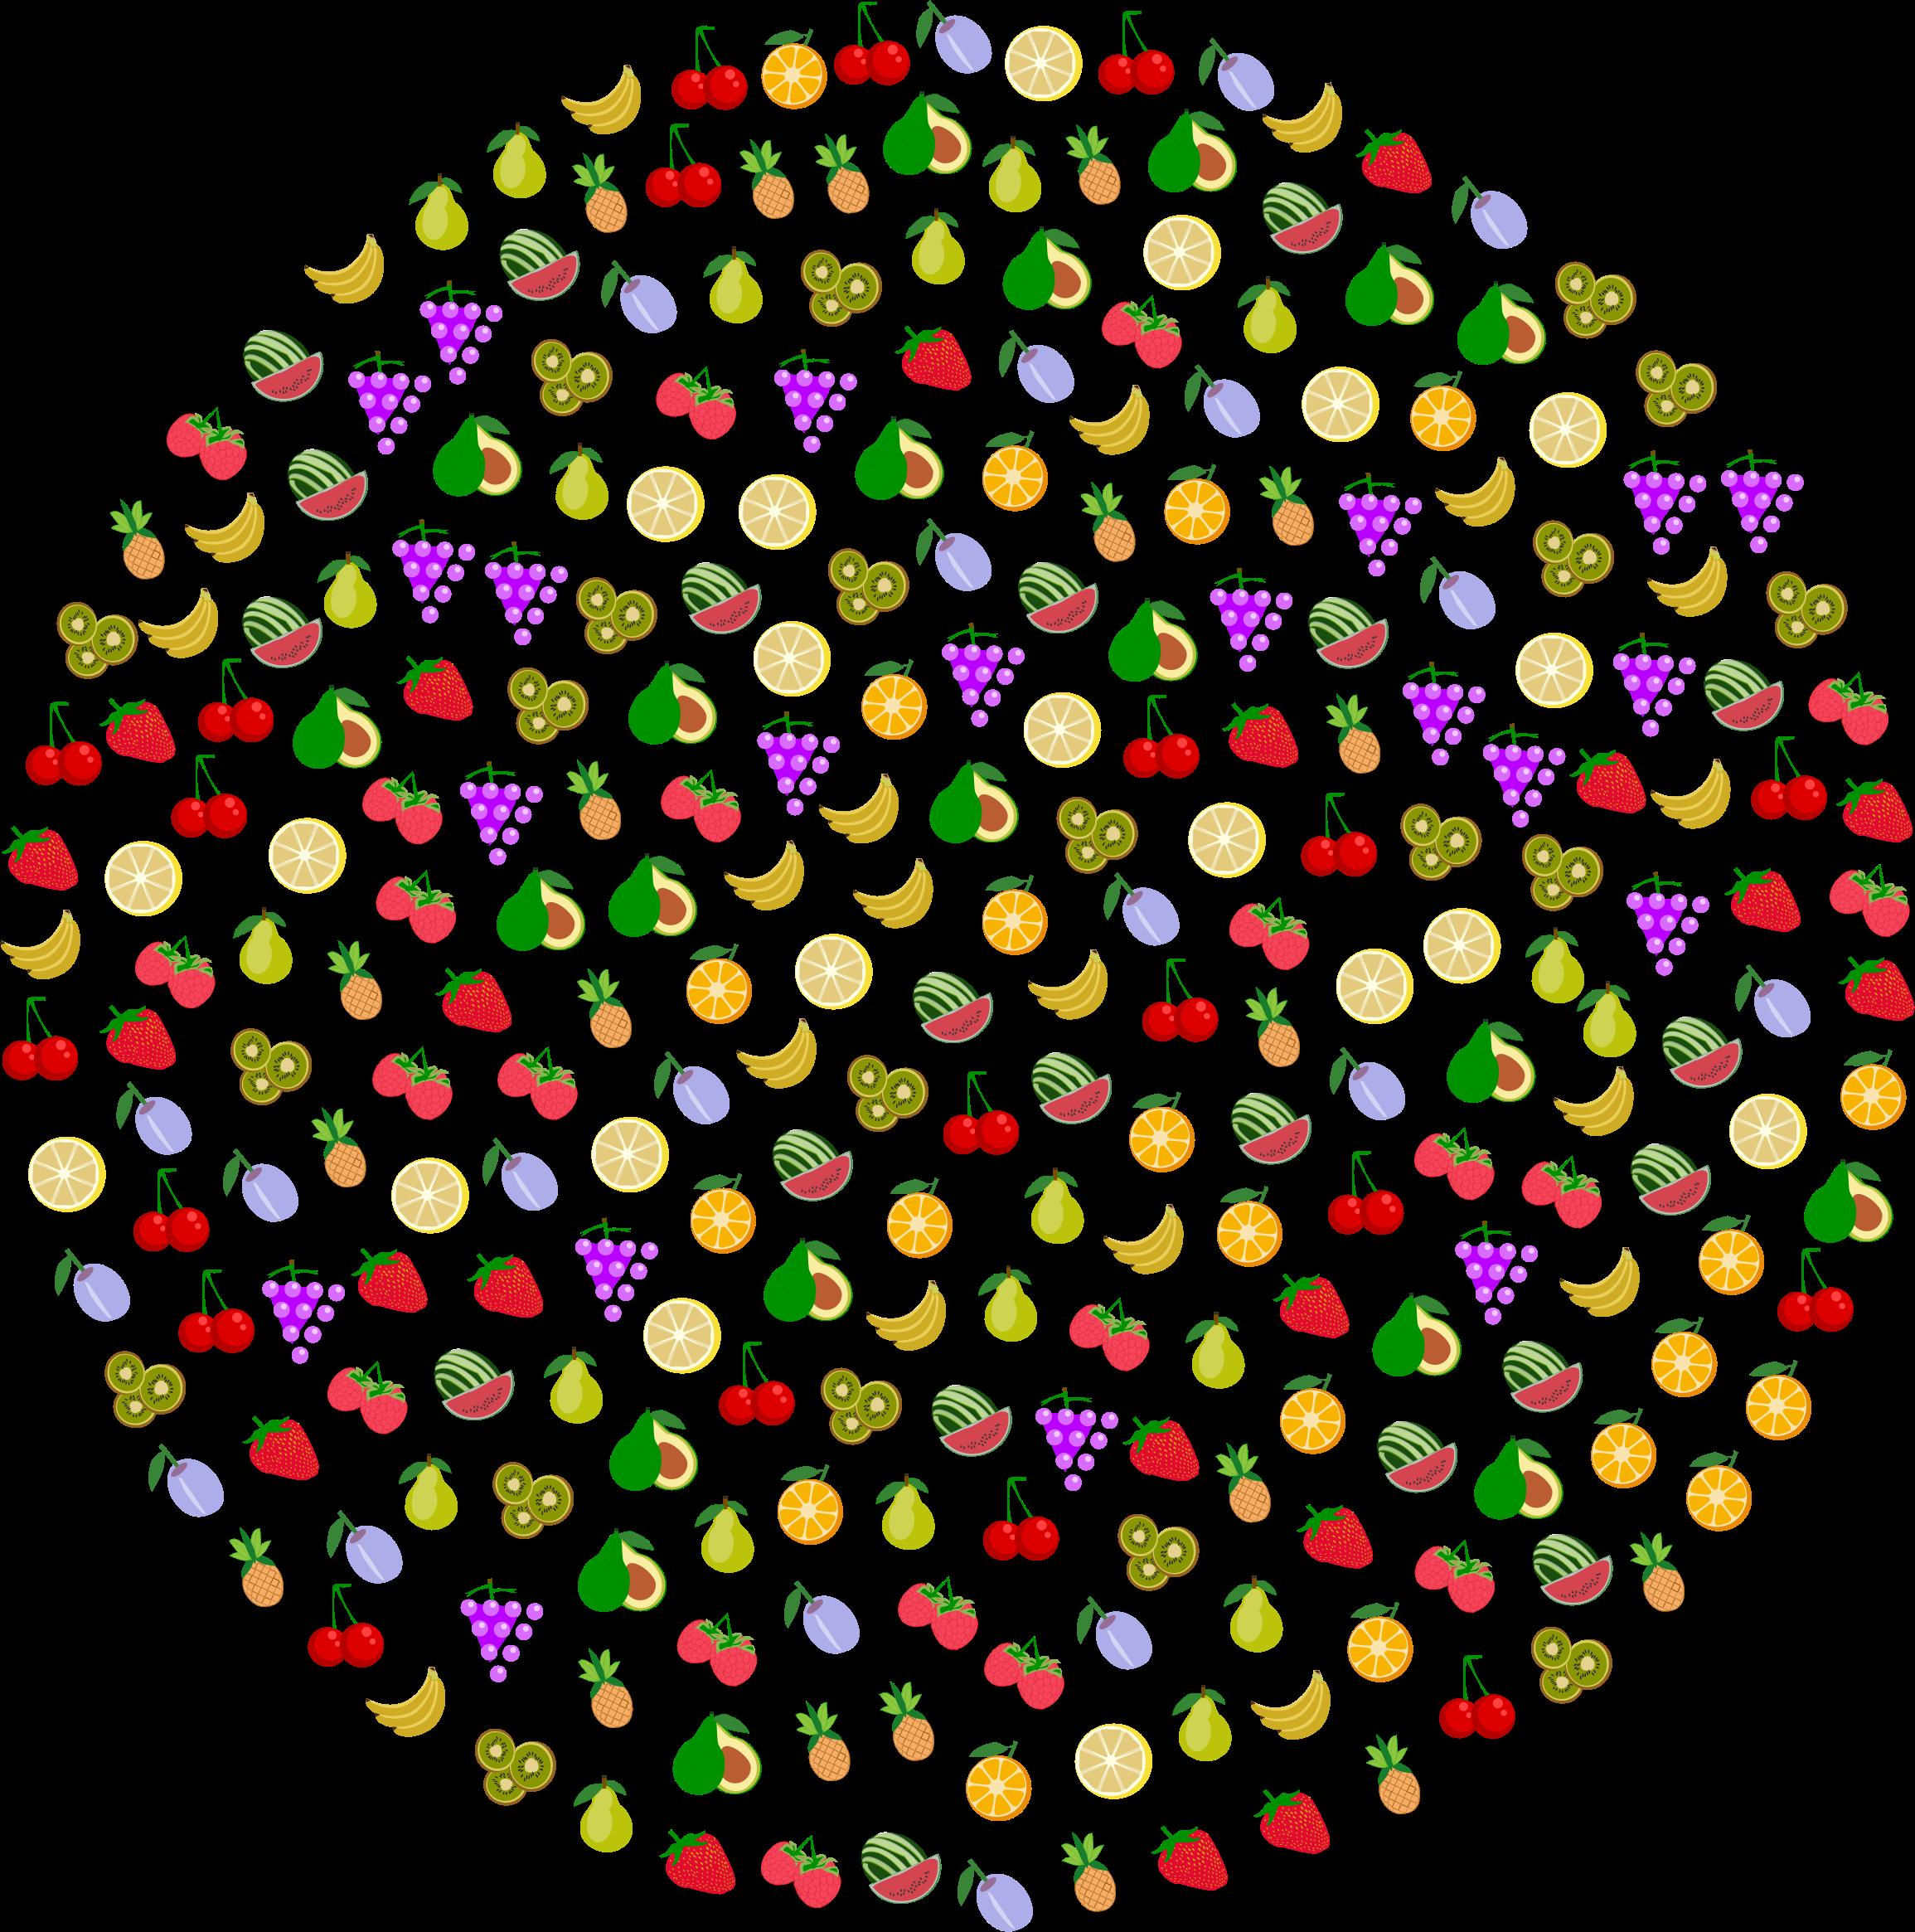 Circle clipart fruit. Big image png